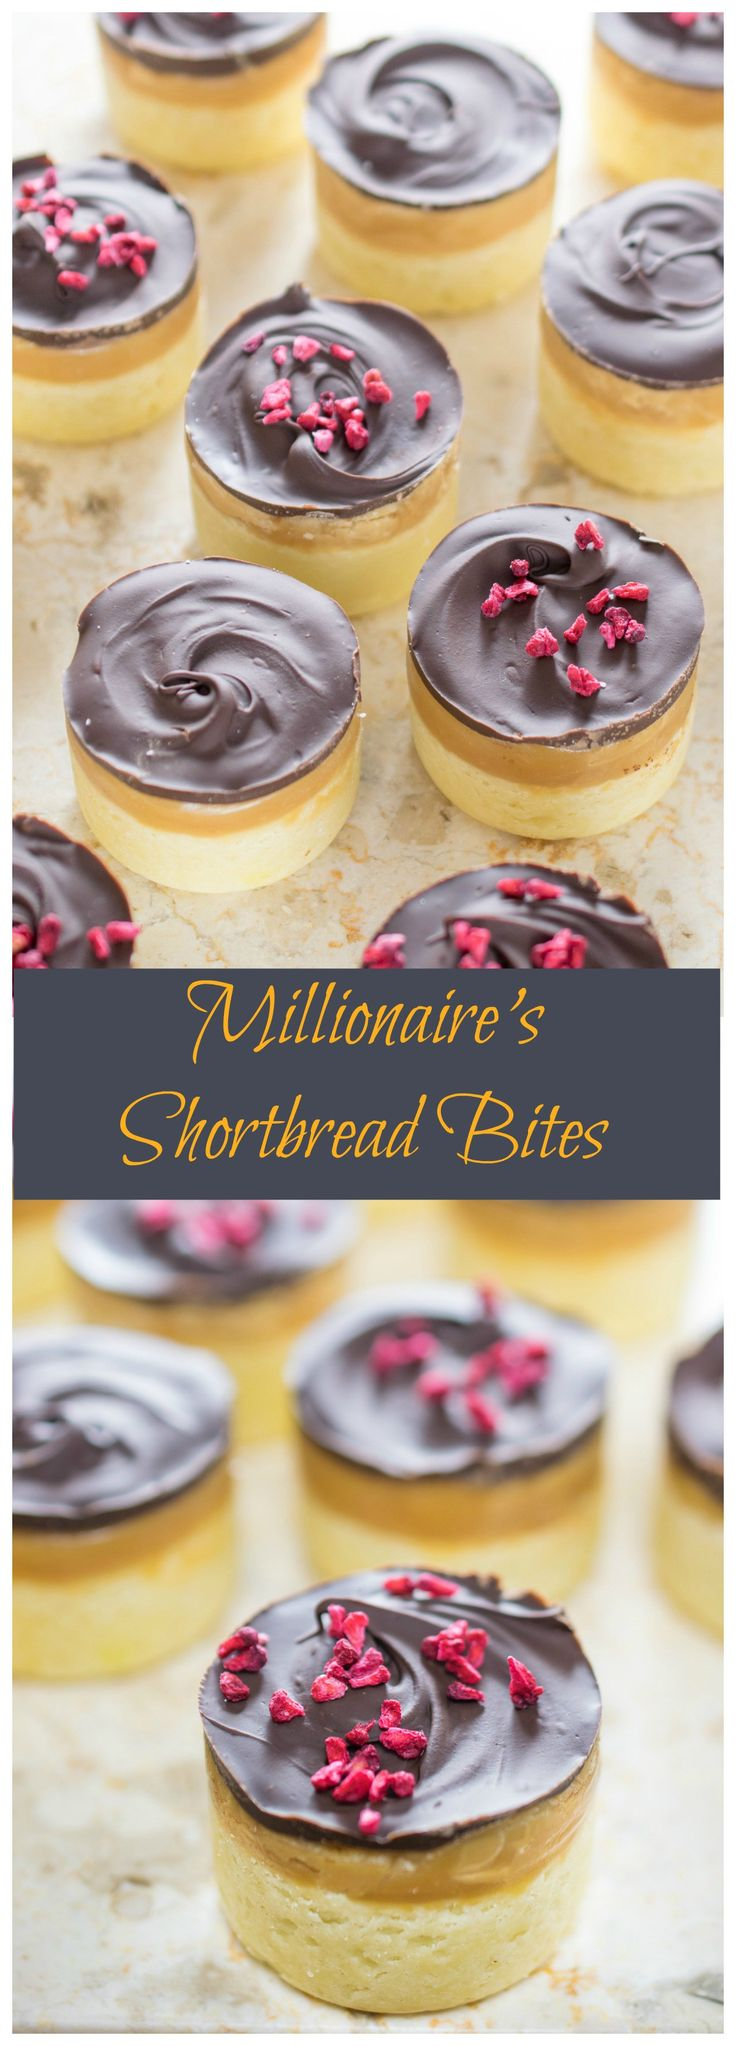 MIllionaire's Shortbread Bites